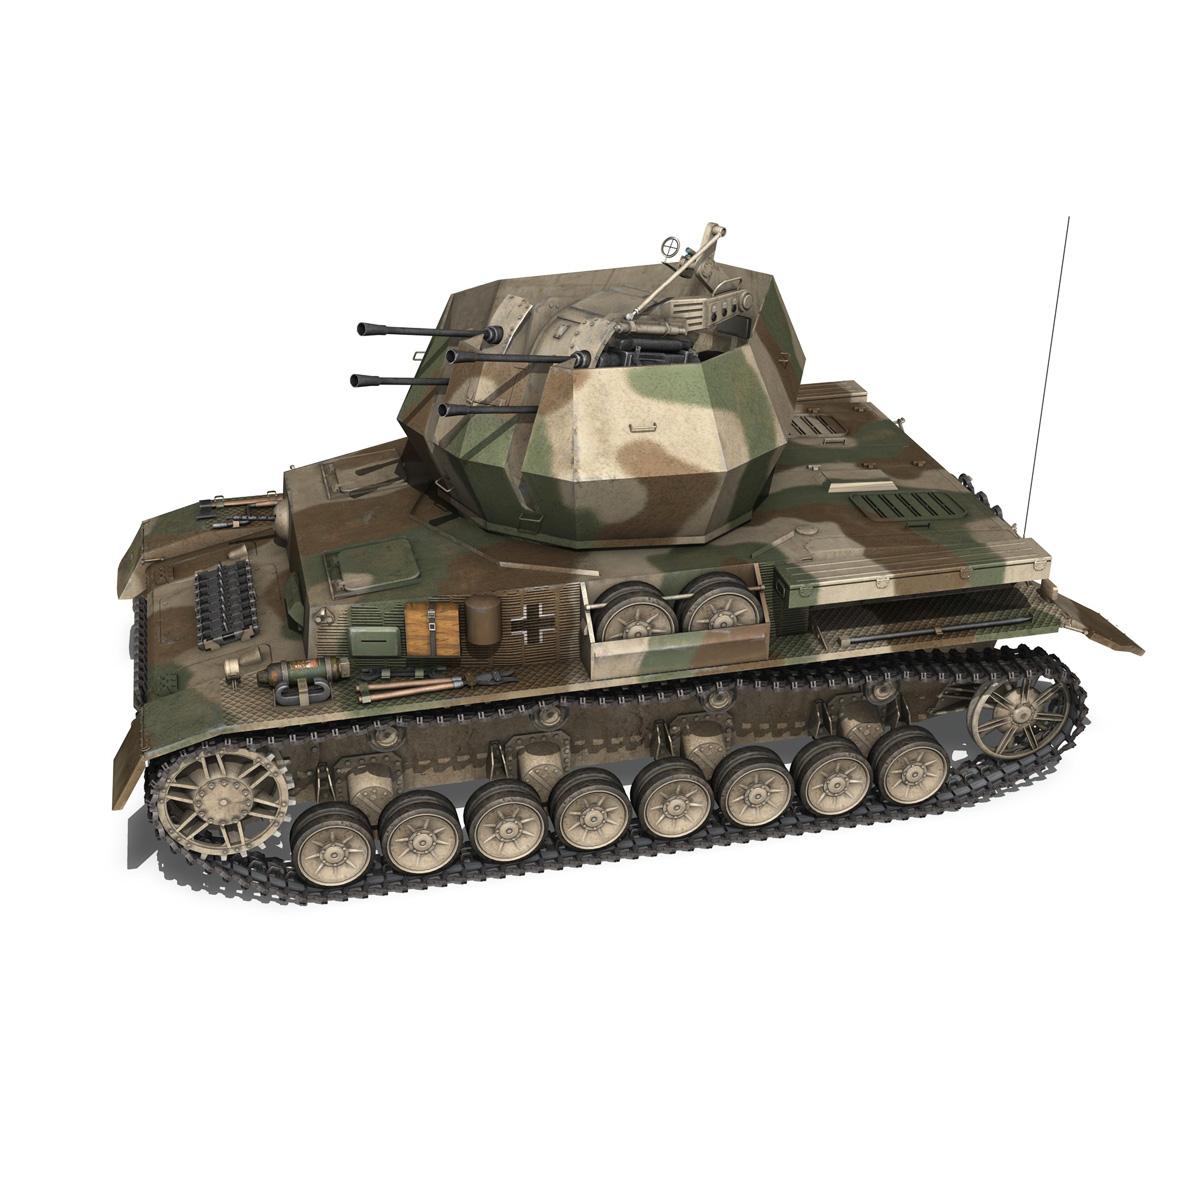 flakpanzer iv – wirbelwind – spzjgabt 654 3d model 3ds fbx c4d lwo obj 282307